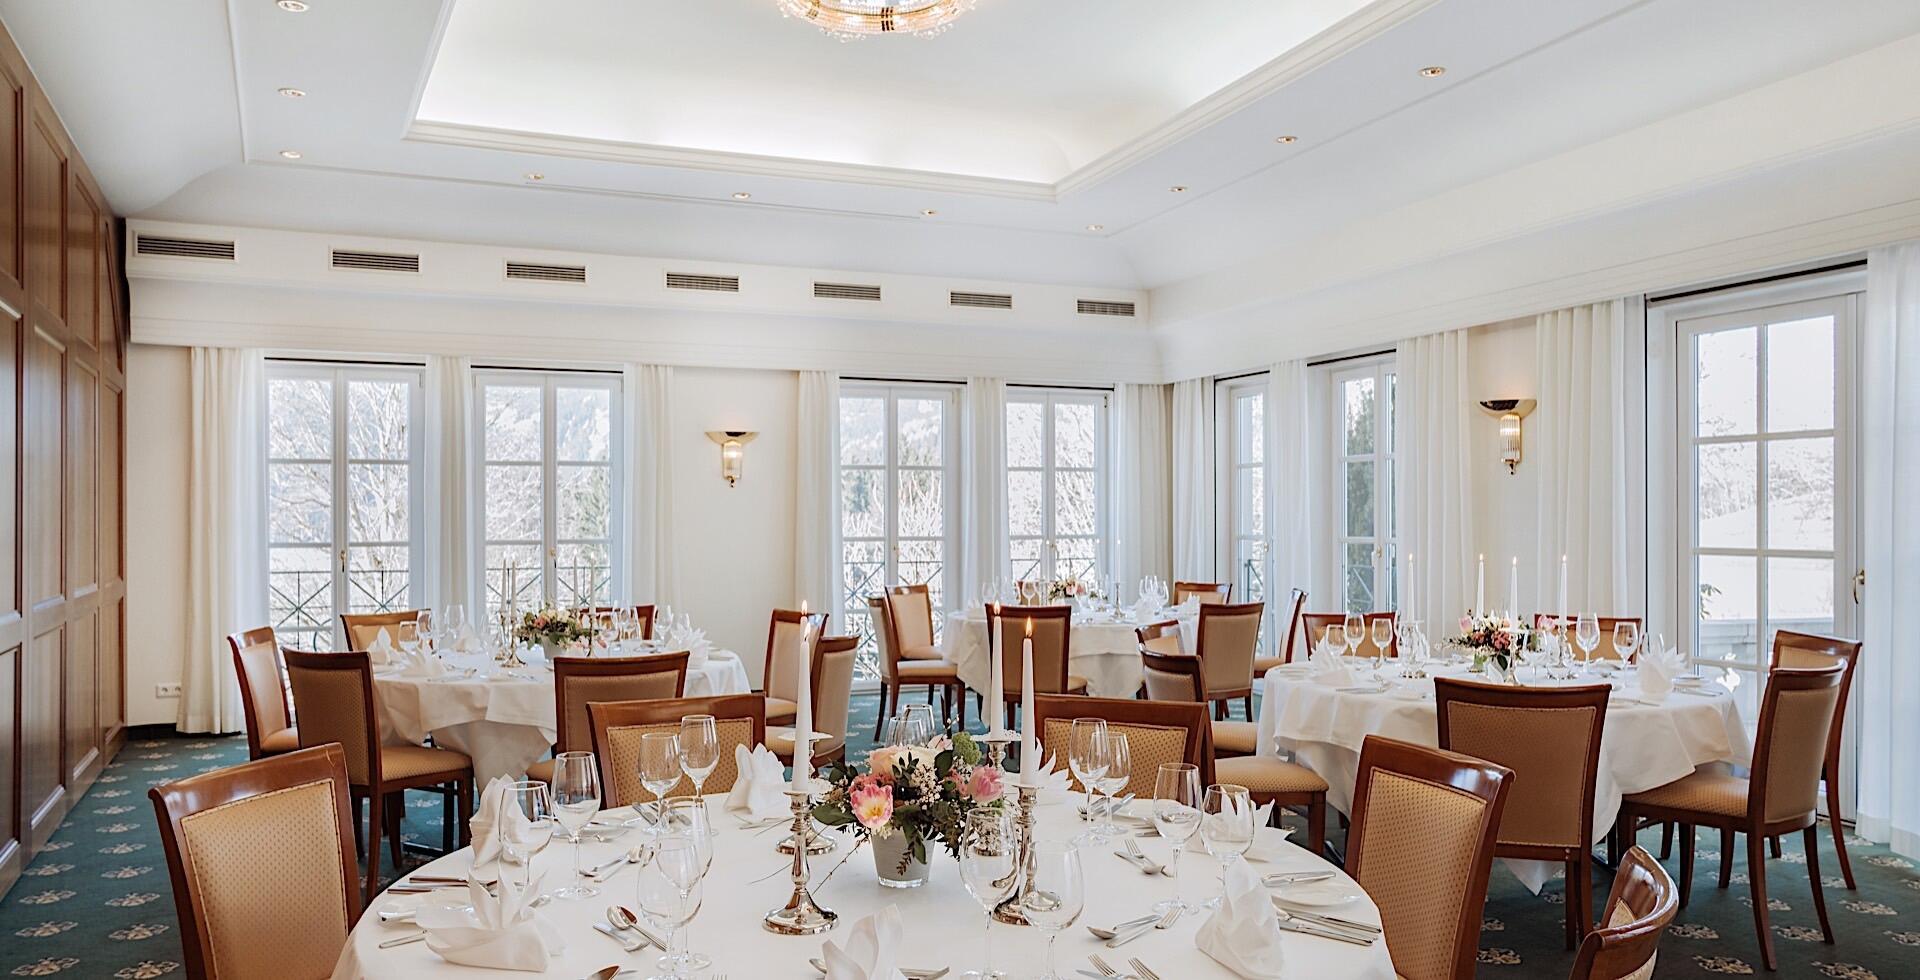 Grimming III - Weddings at Romantik Hotel Schloss Pichlarn, Aust